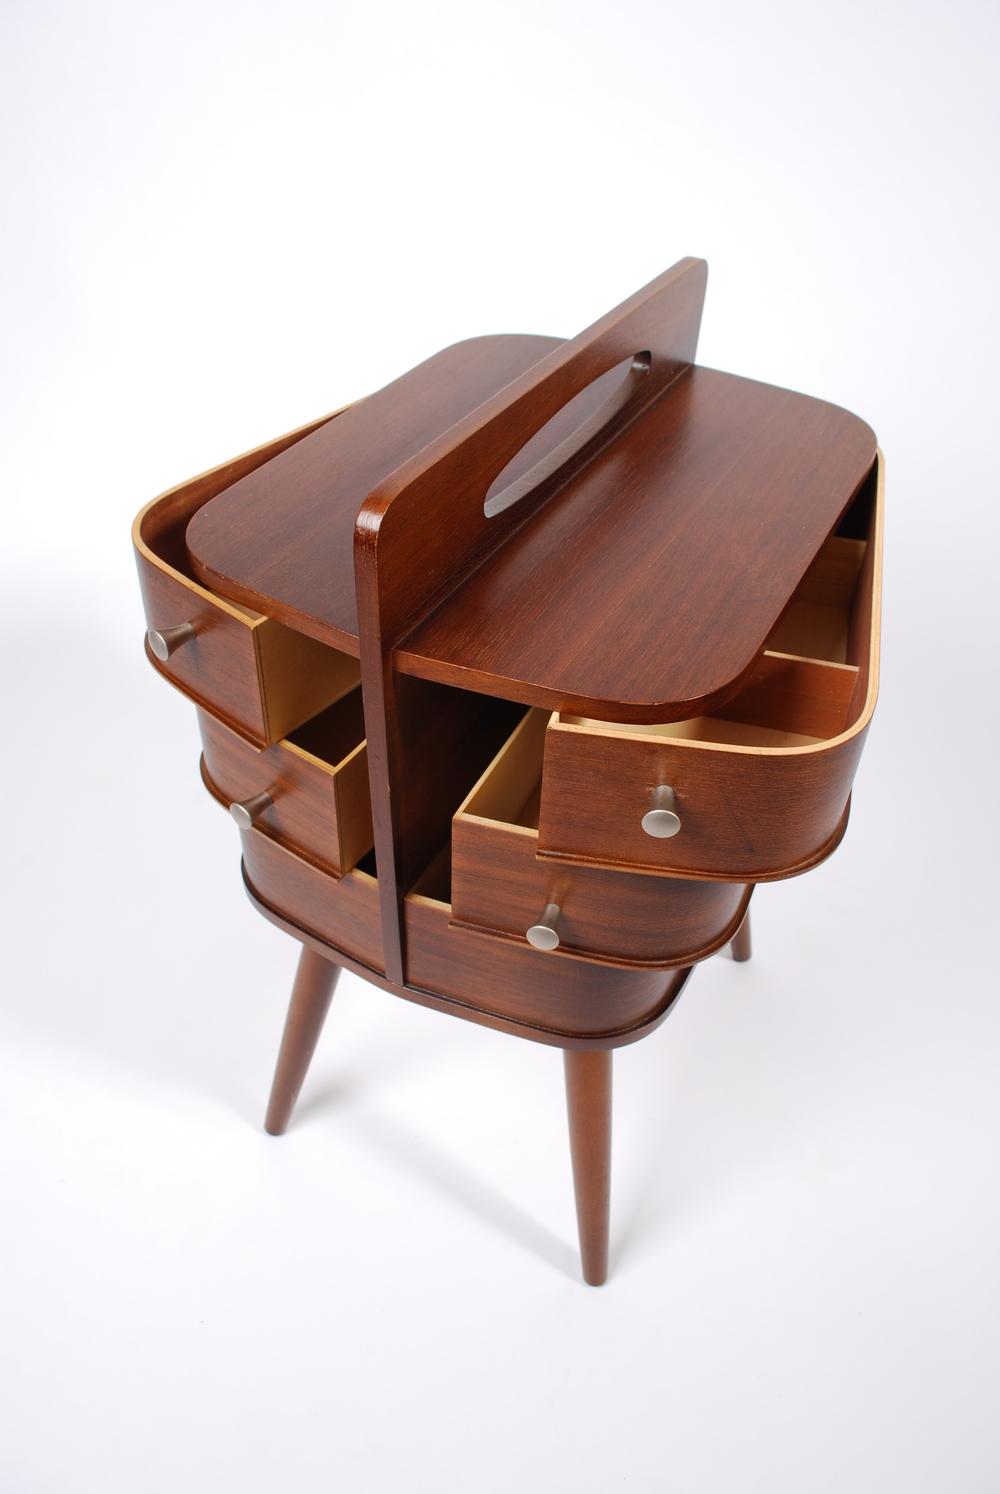 Sewing box, 60's Danish design